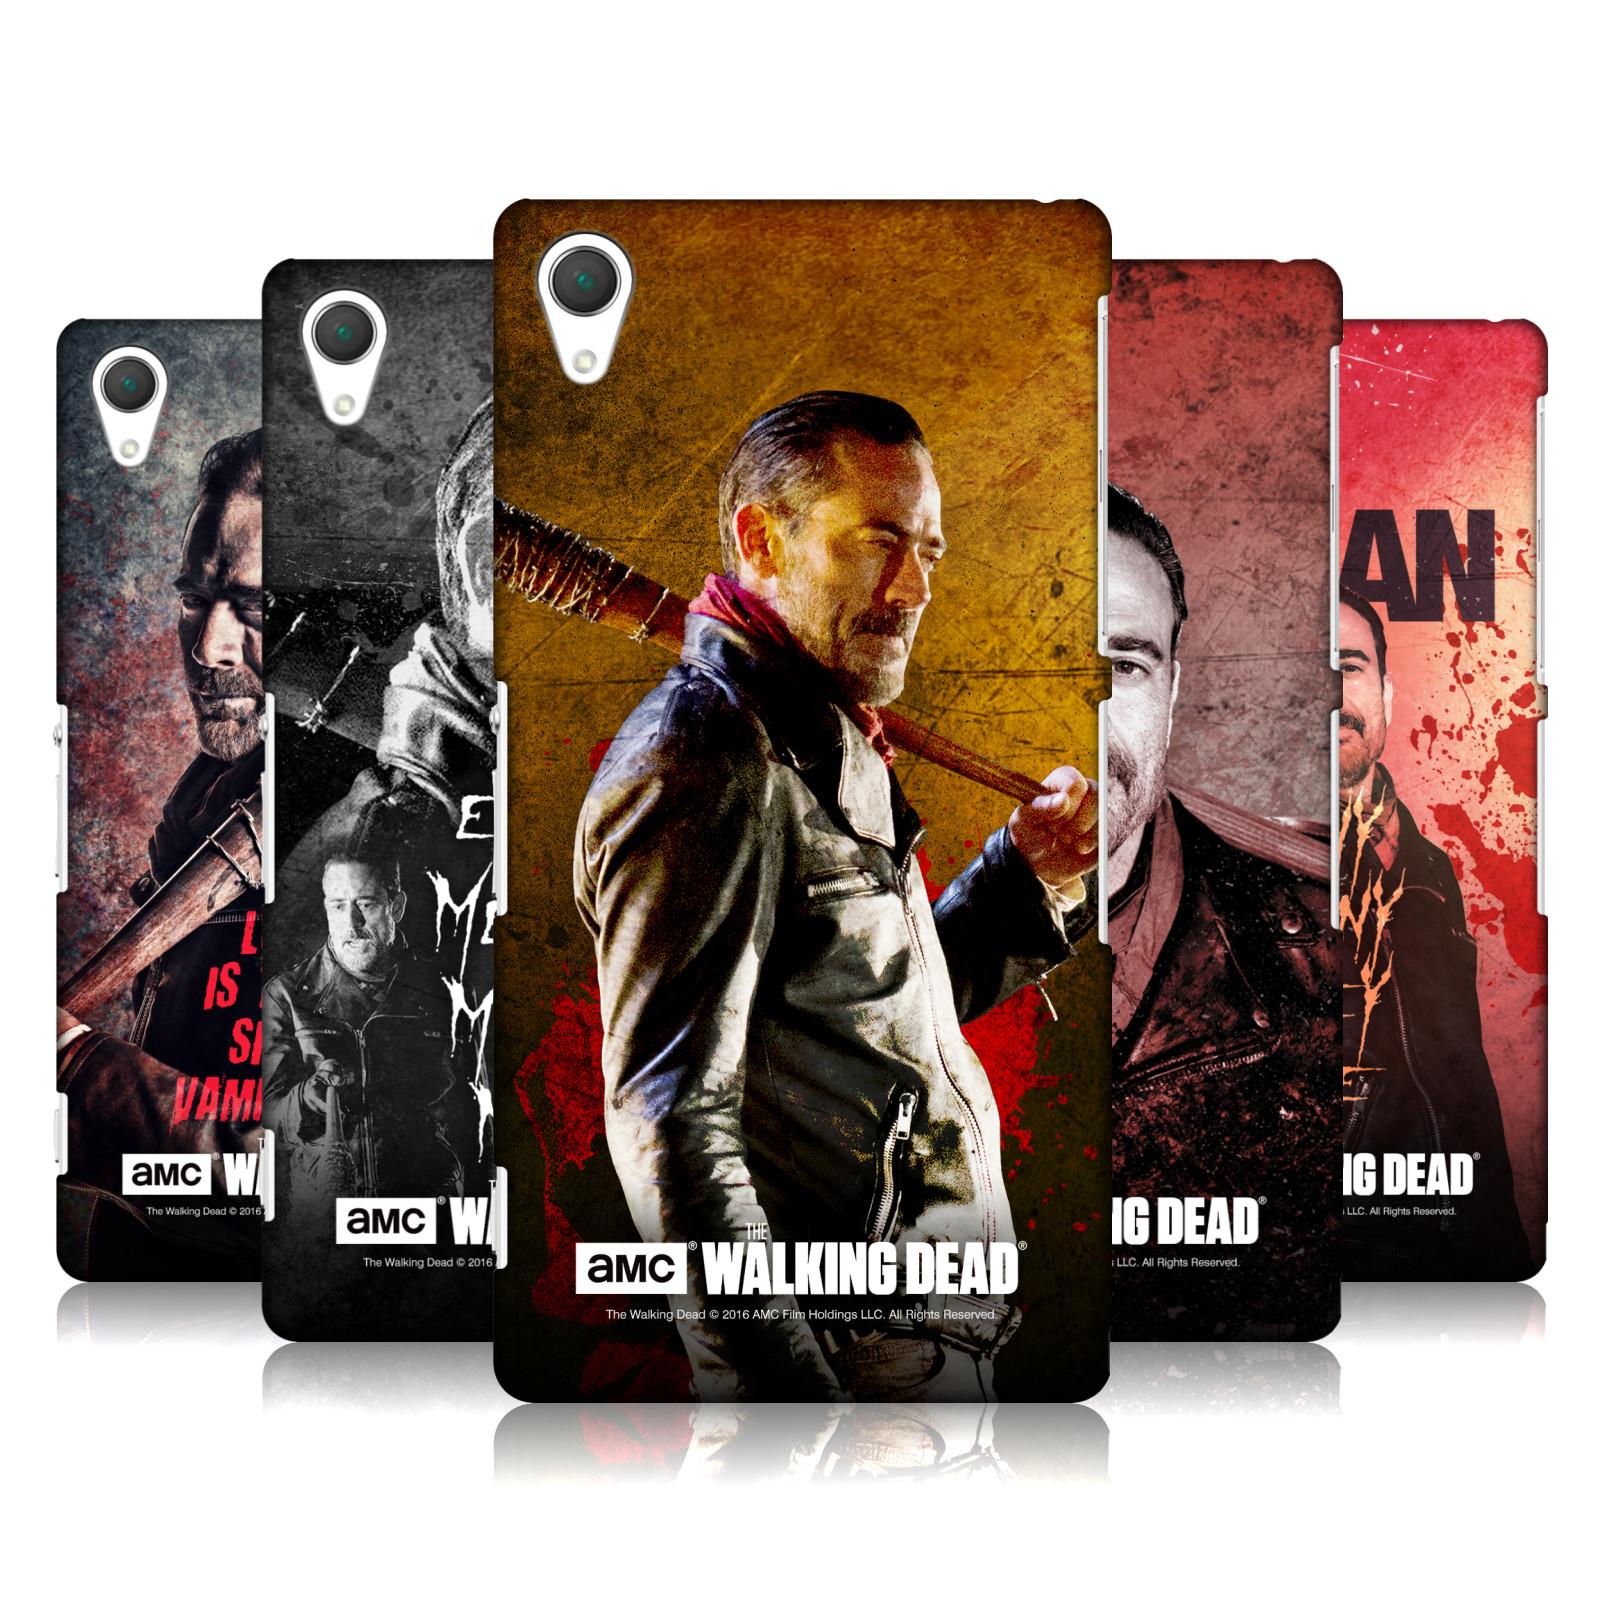 OFFICIAL-AMC-THE-WALKING-DEAD-NEGAN-HARD-BACK-CASE-FOR-SONY-PHONES-2